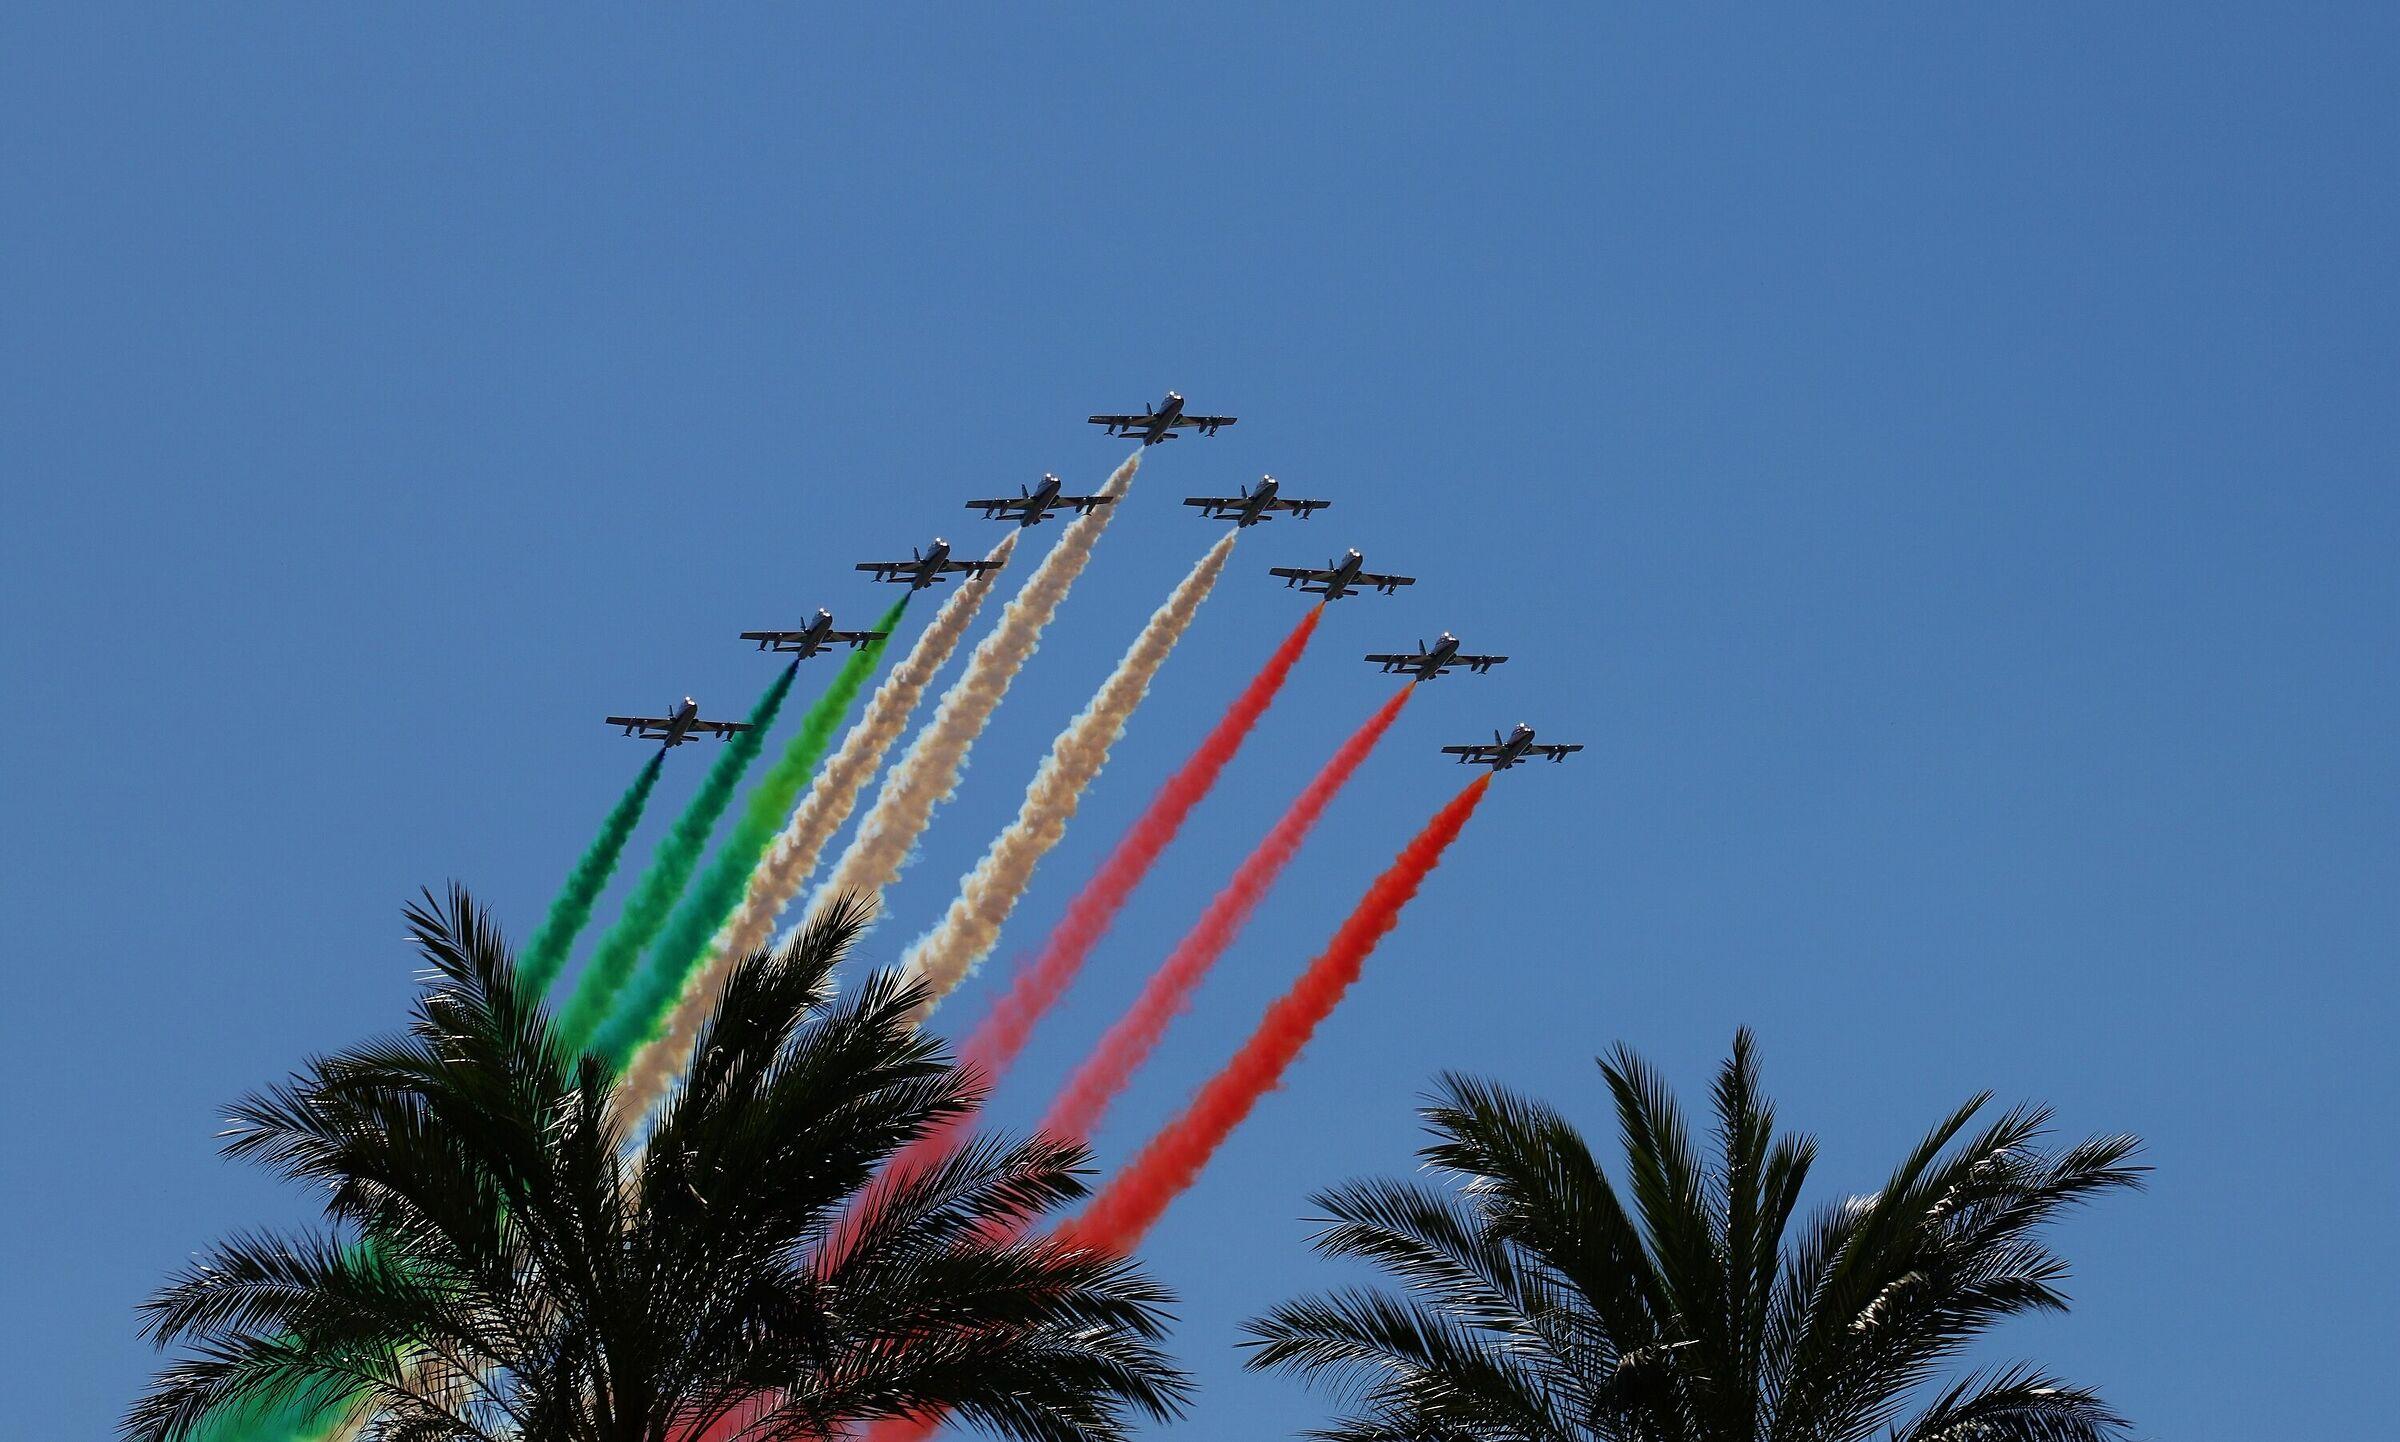 In the sky of Genoa...